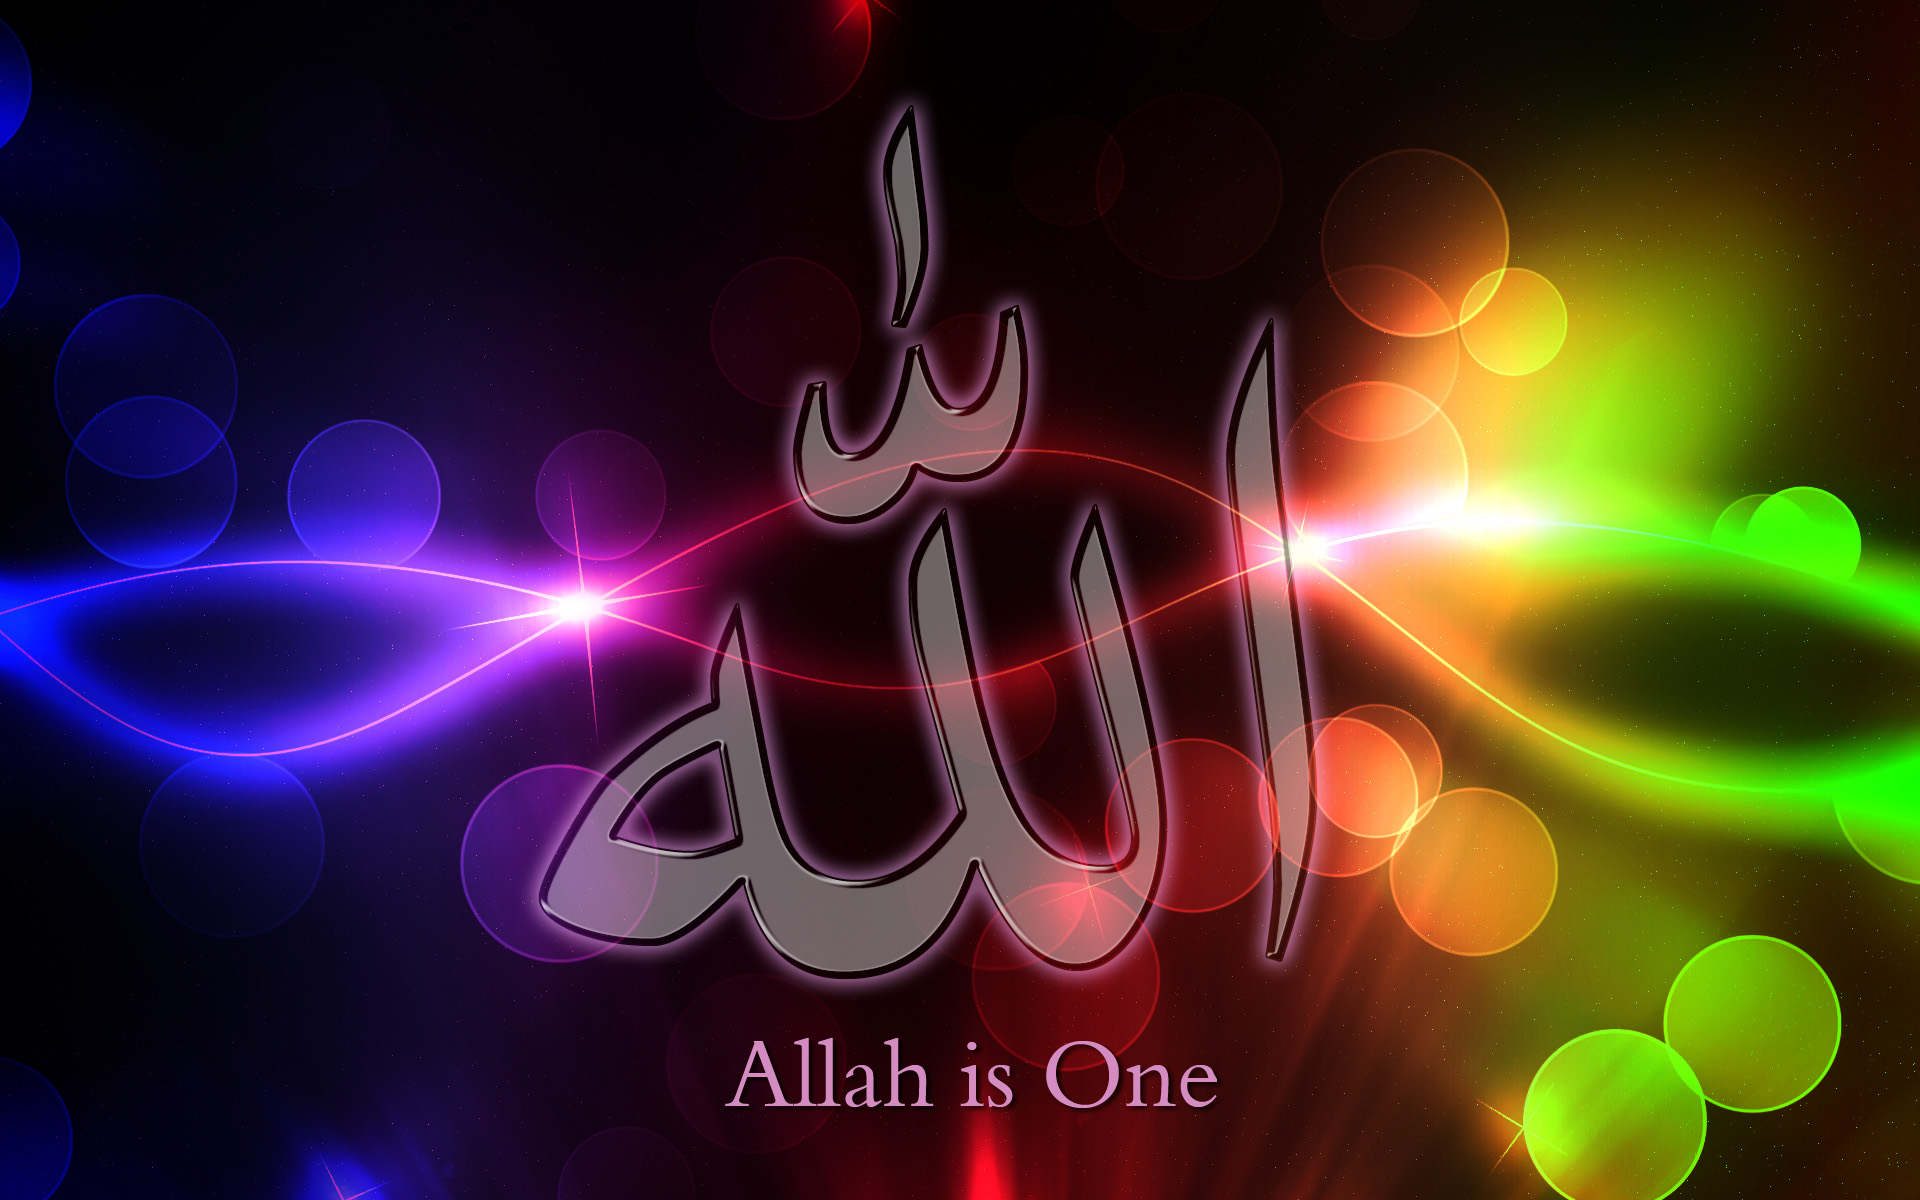 Allah is One Wallpaper HD Wallpaper 1920x1200